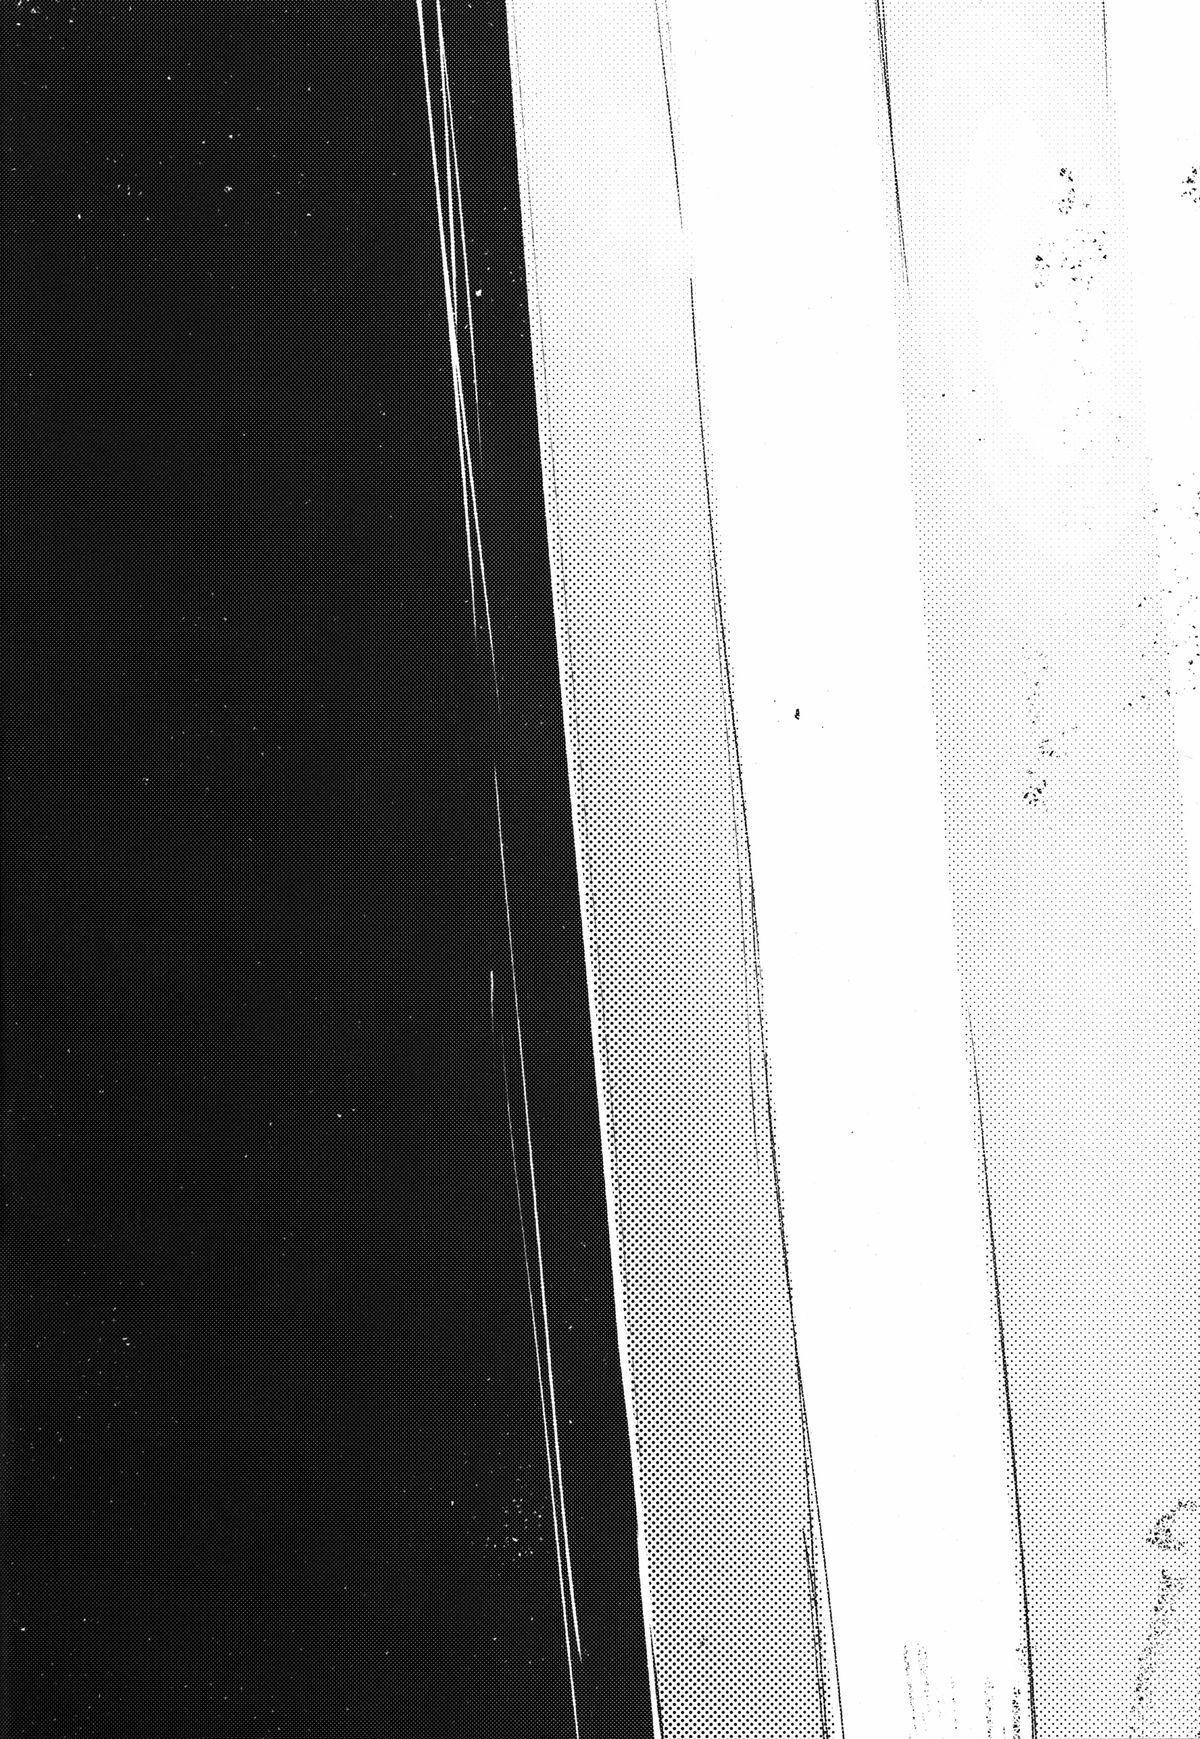 (COMIC1☆9) [Sakekan Memorial (SOLOPIPB)] Shiragasane -Tamoto-   Layers of White 2 [English] [rampantserenity] 33